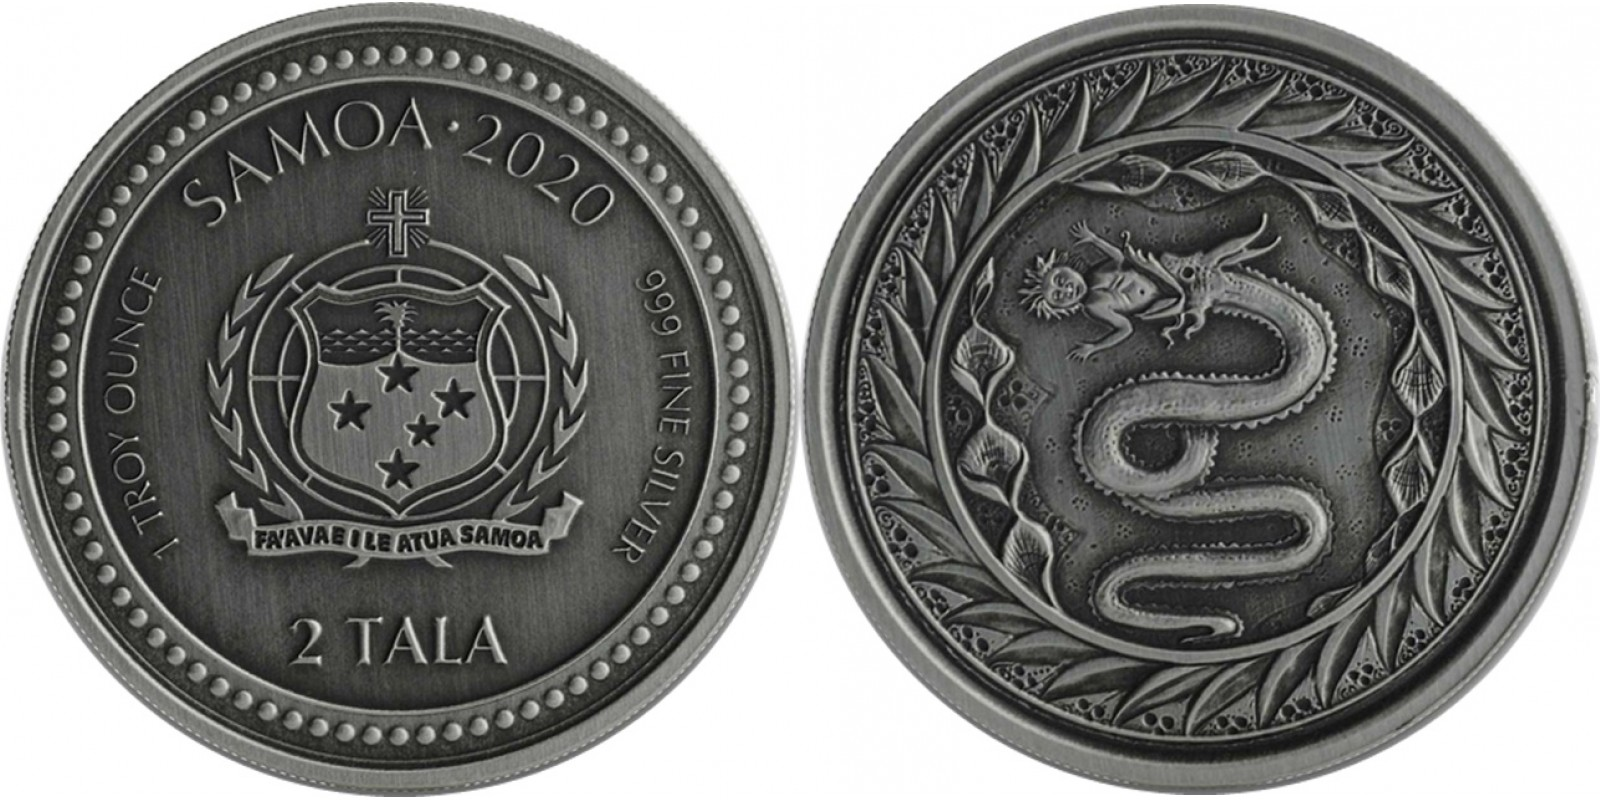 samoa-2020-serpent-de-milan-antique